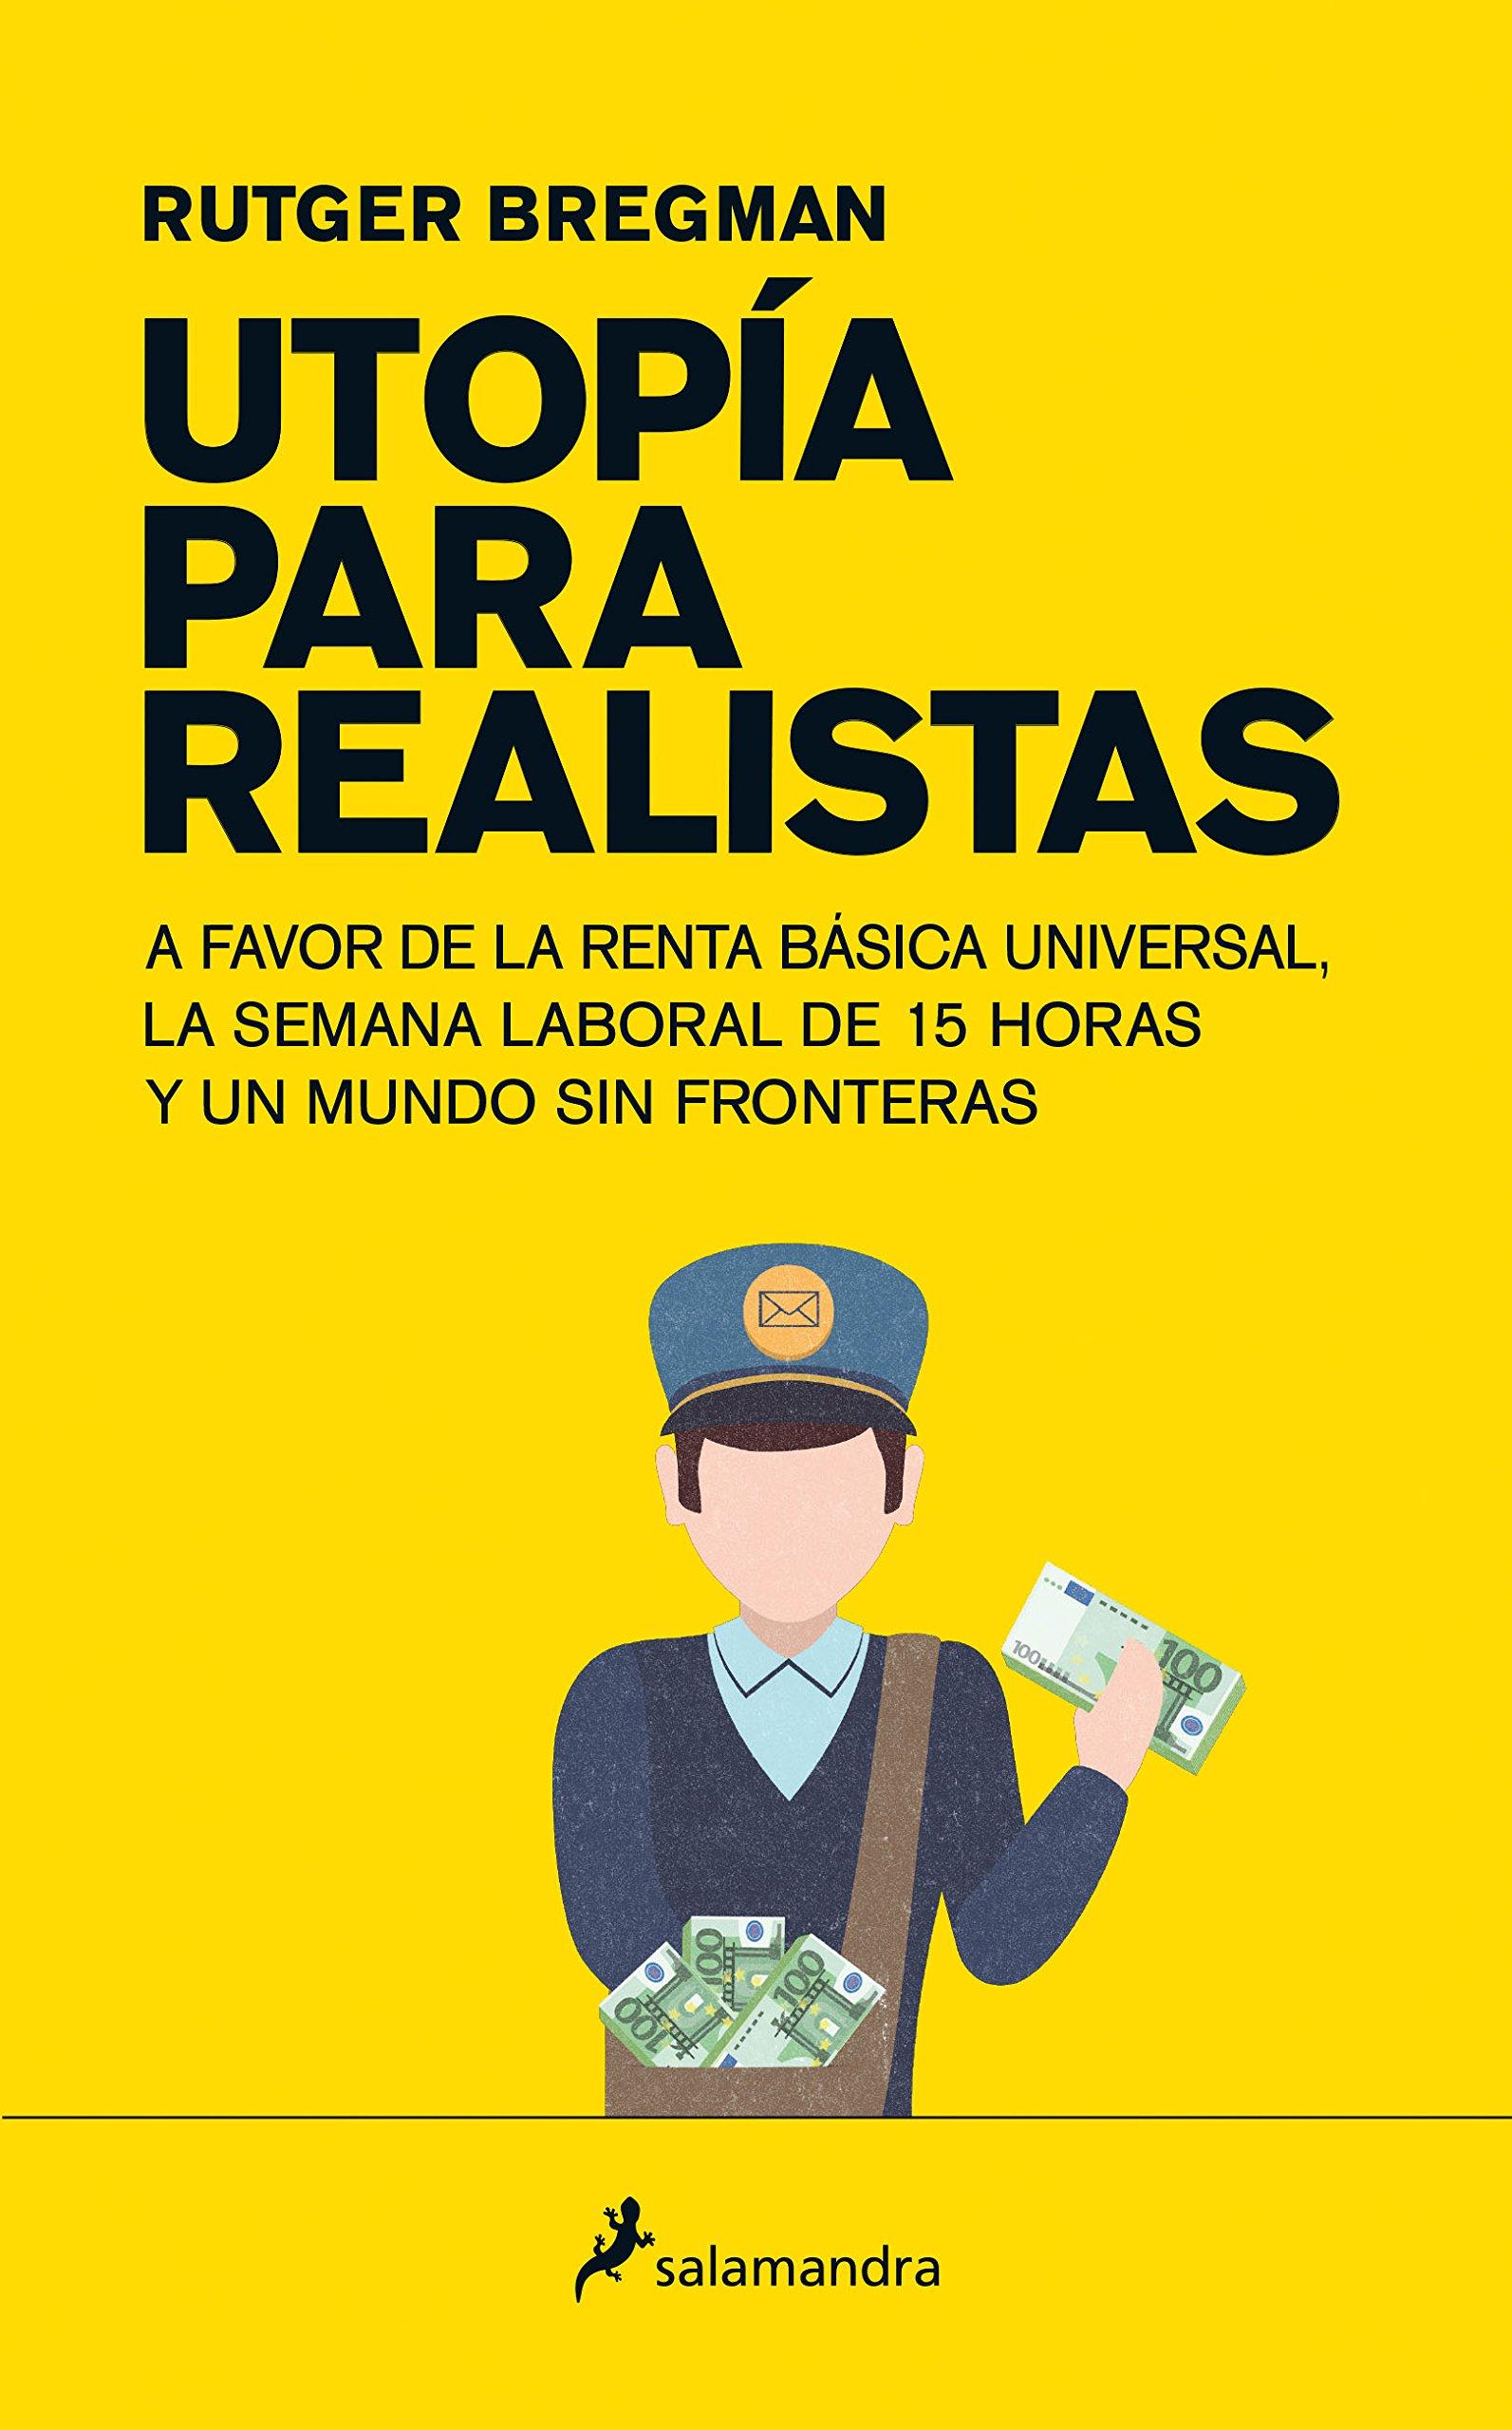 Portada libro - Utopía para realistas